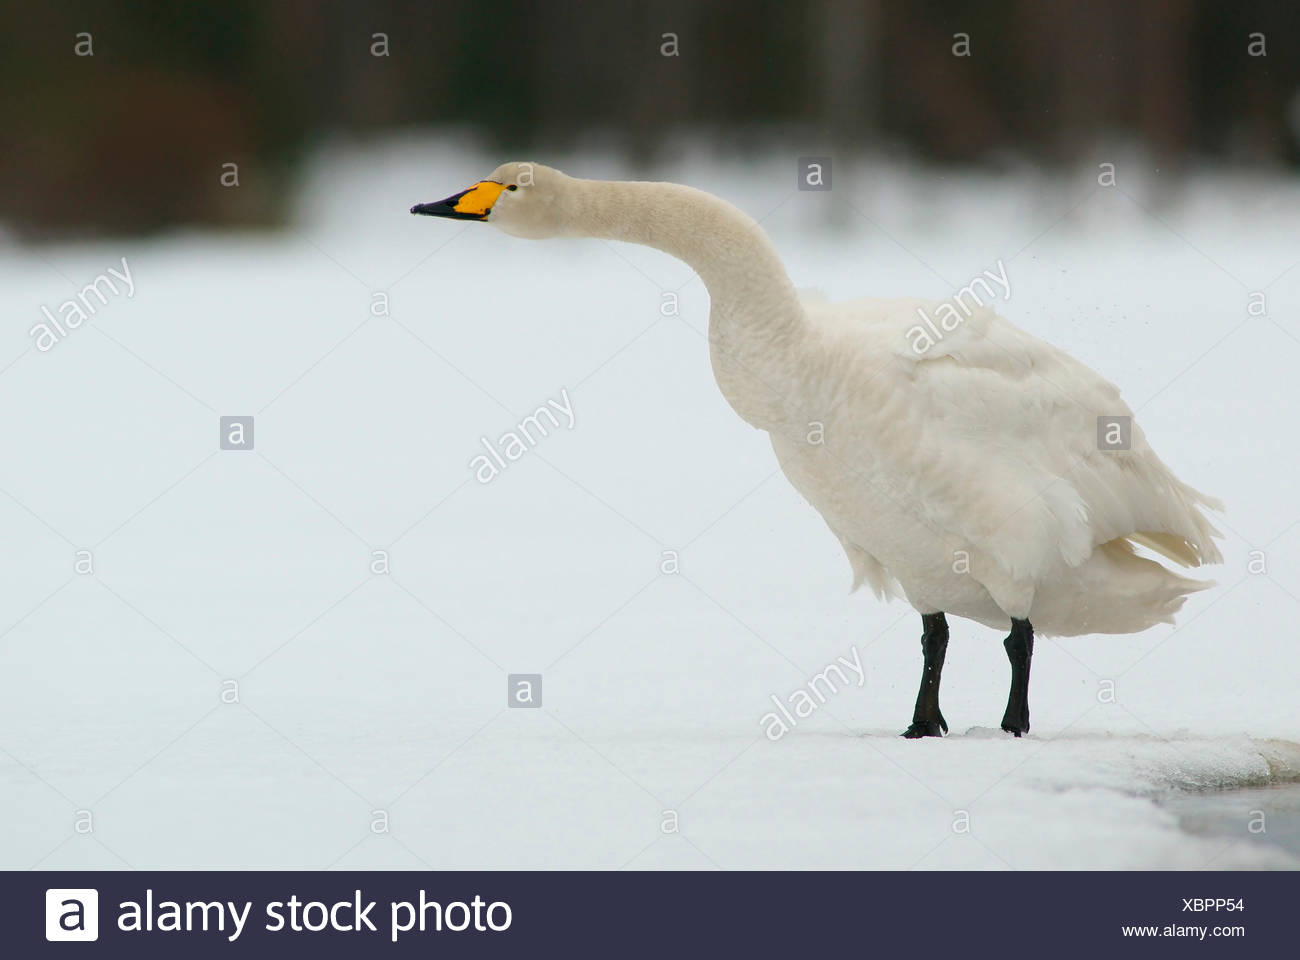 Cisnes cantores (Cygnus cygnus), actitud amenazadora, Kuusamo, Finlandia Imagen De Stock